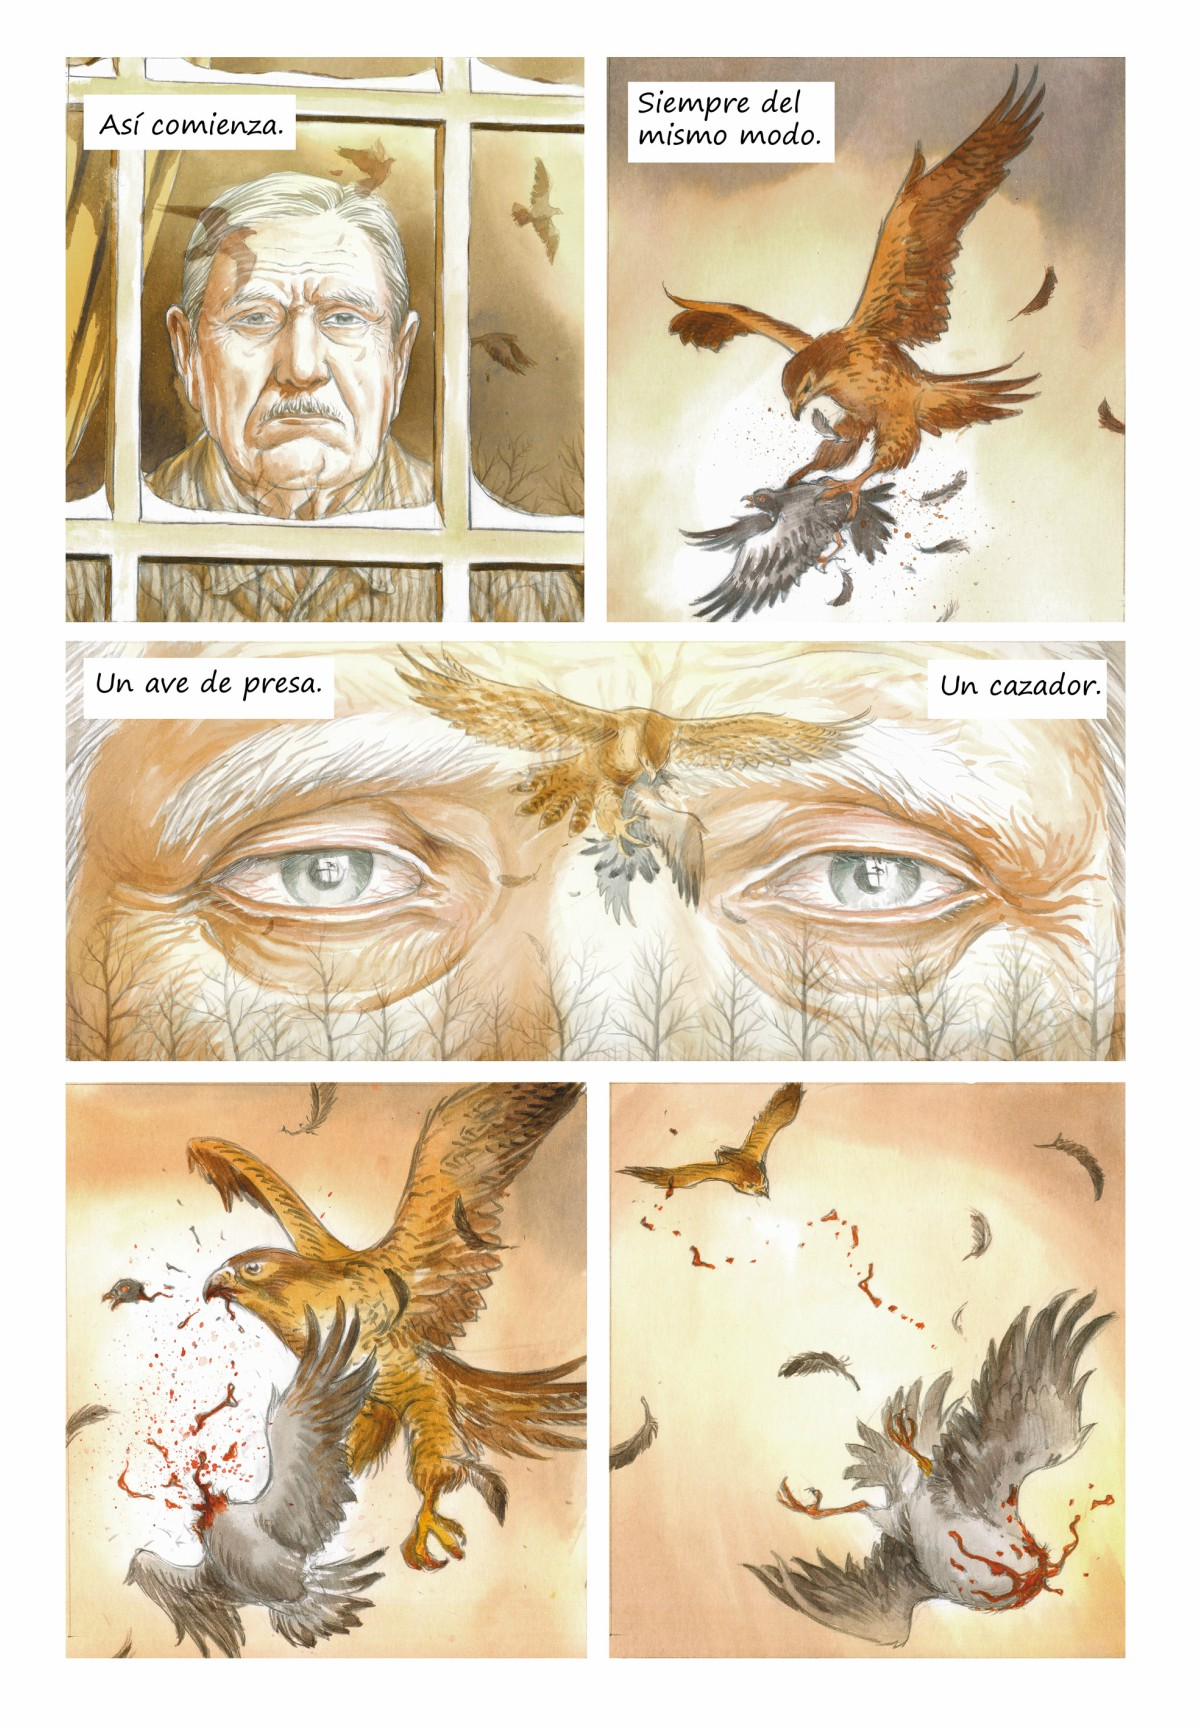 De Allende A Pinochet Recuperacion De La Memoria Via La Novela Grafica Cuarto Mundo